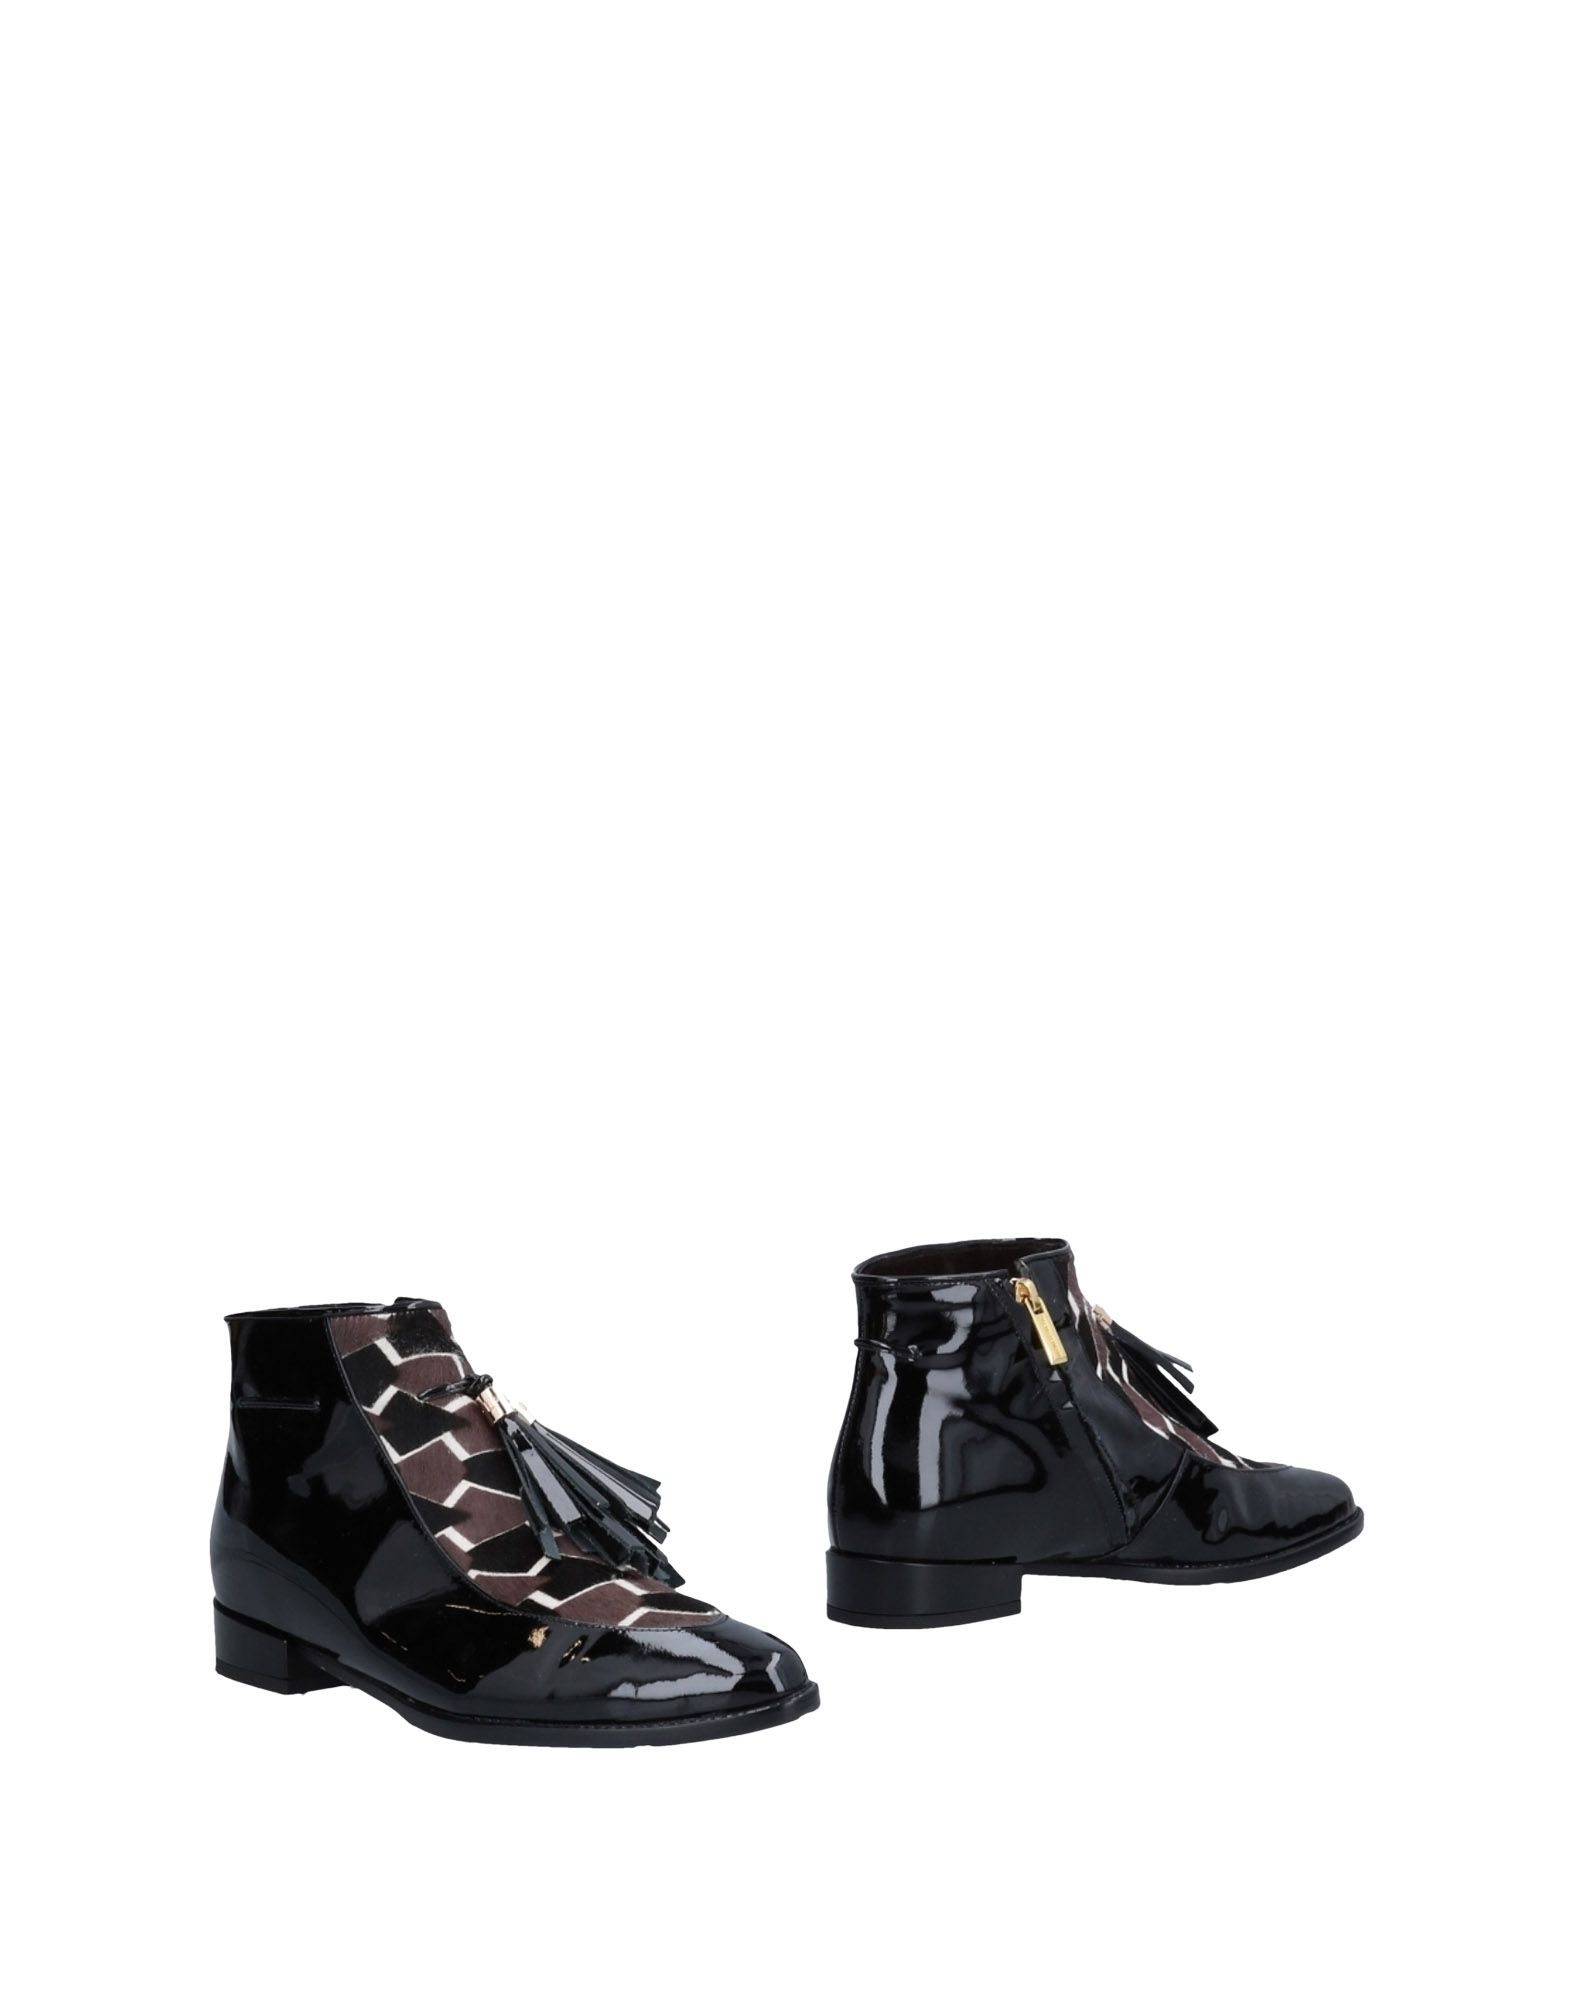 Loretta Pettinari Ankle Boot - Boots Women Loretta Pettinari Ankle Boots - online on  United Kingdom - 11494303WB 079be8